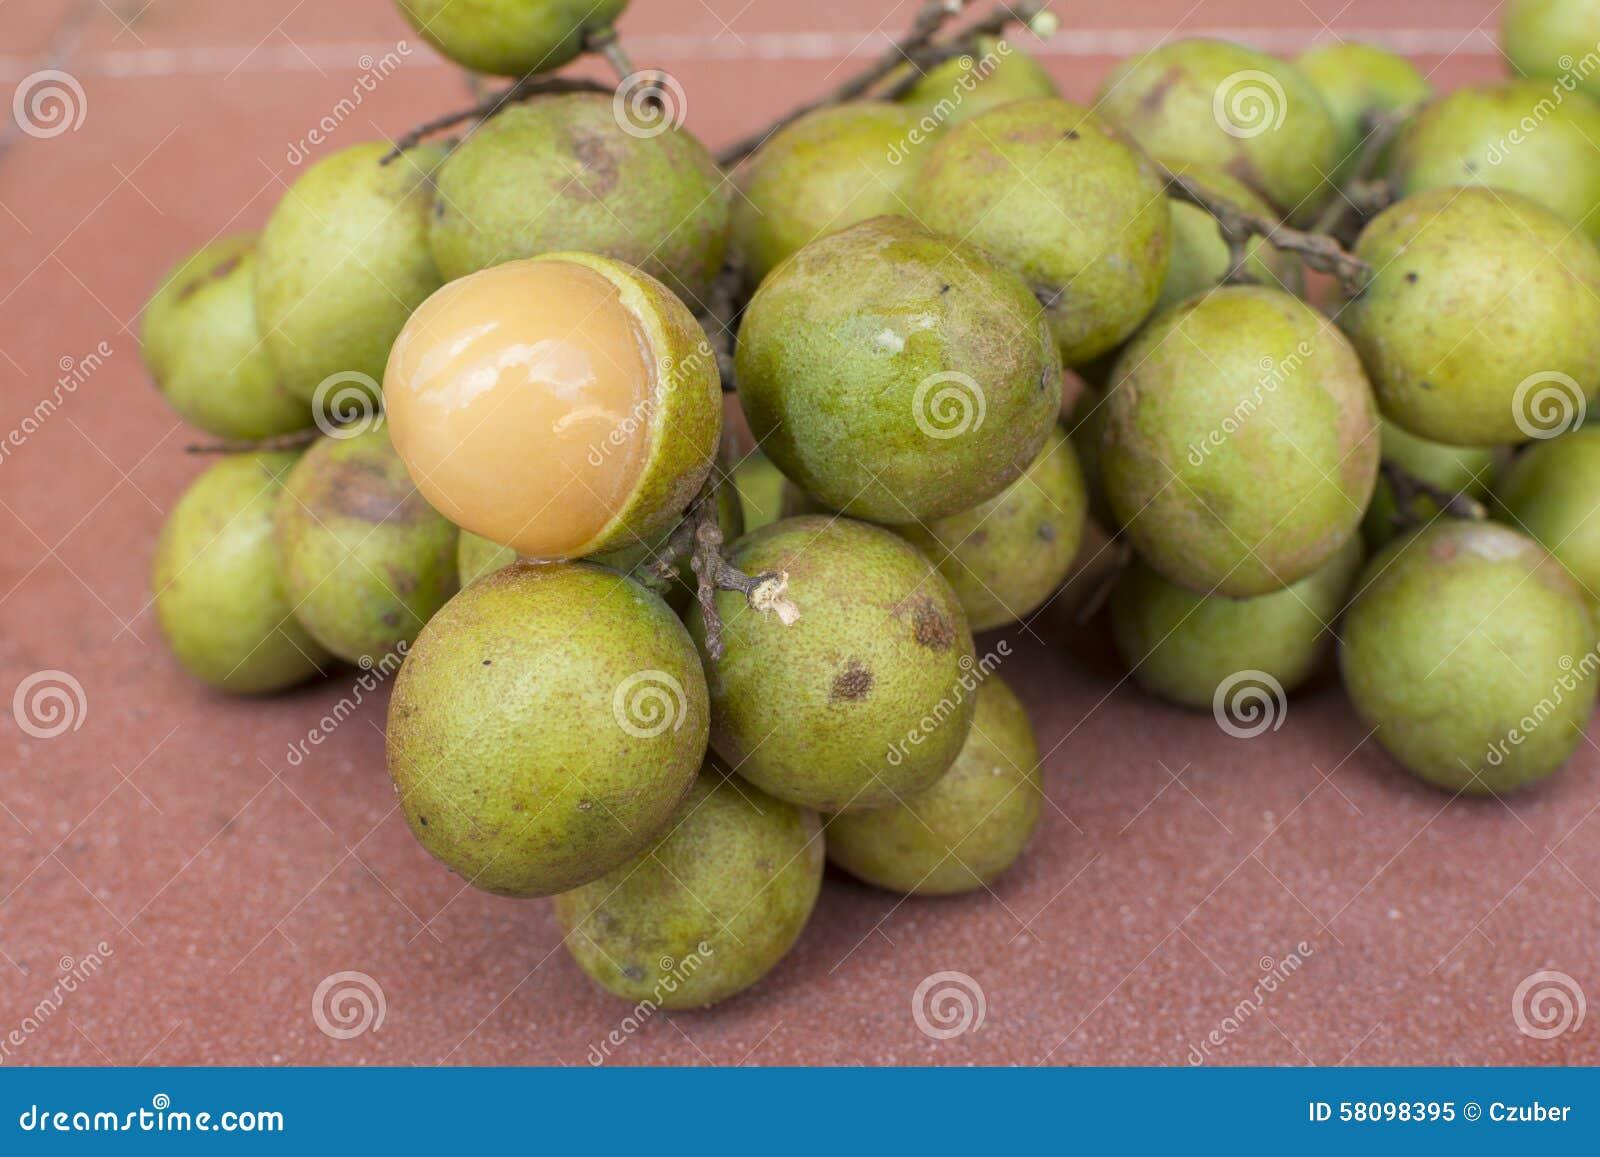 Date fruit in spanish in Brisbane